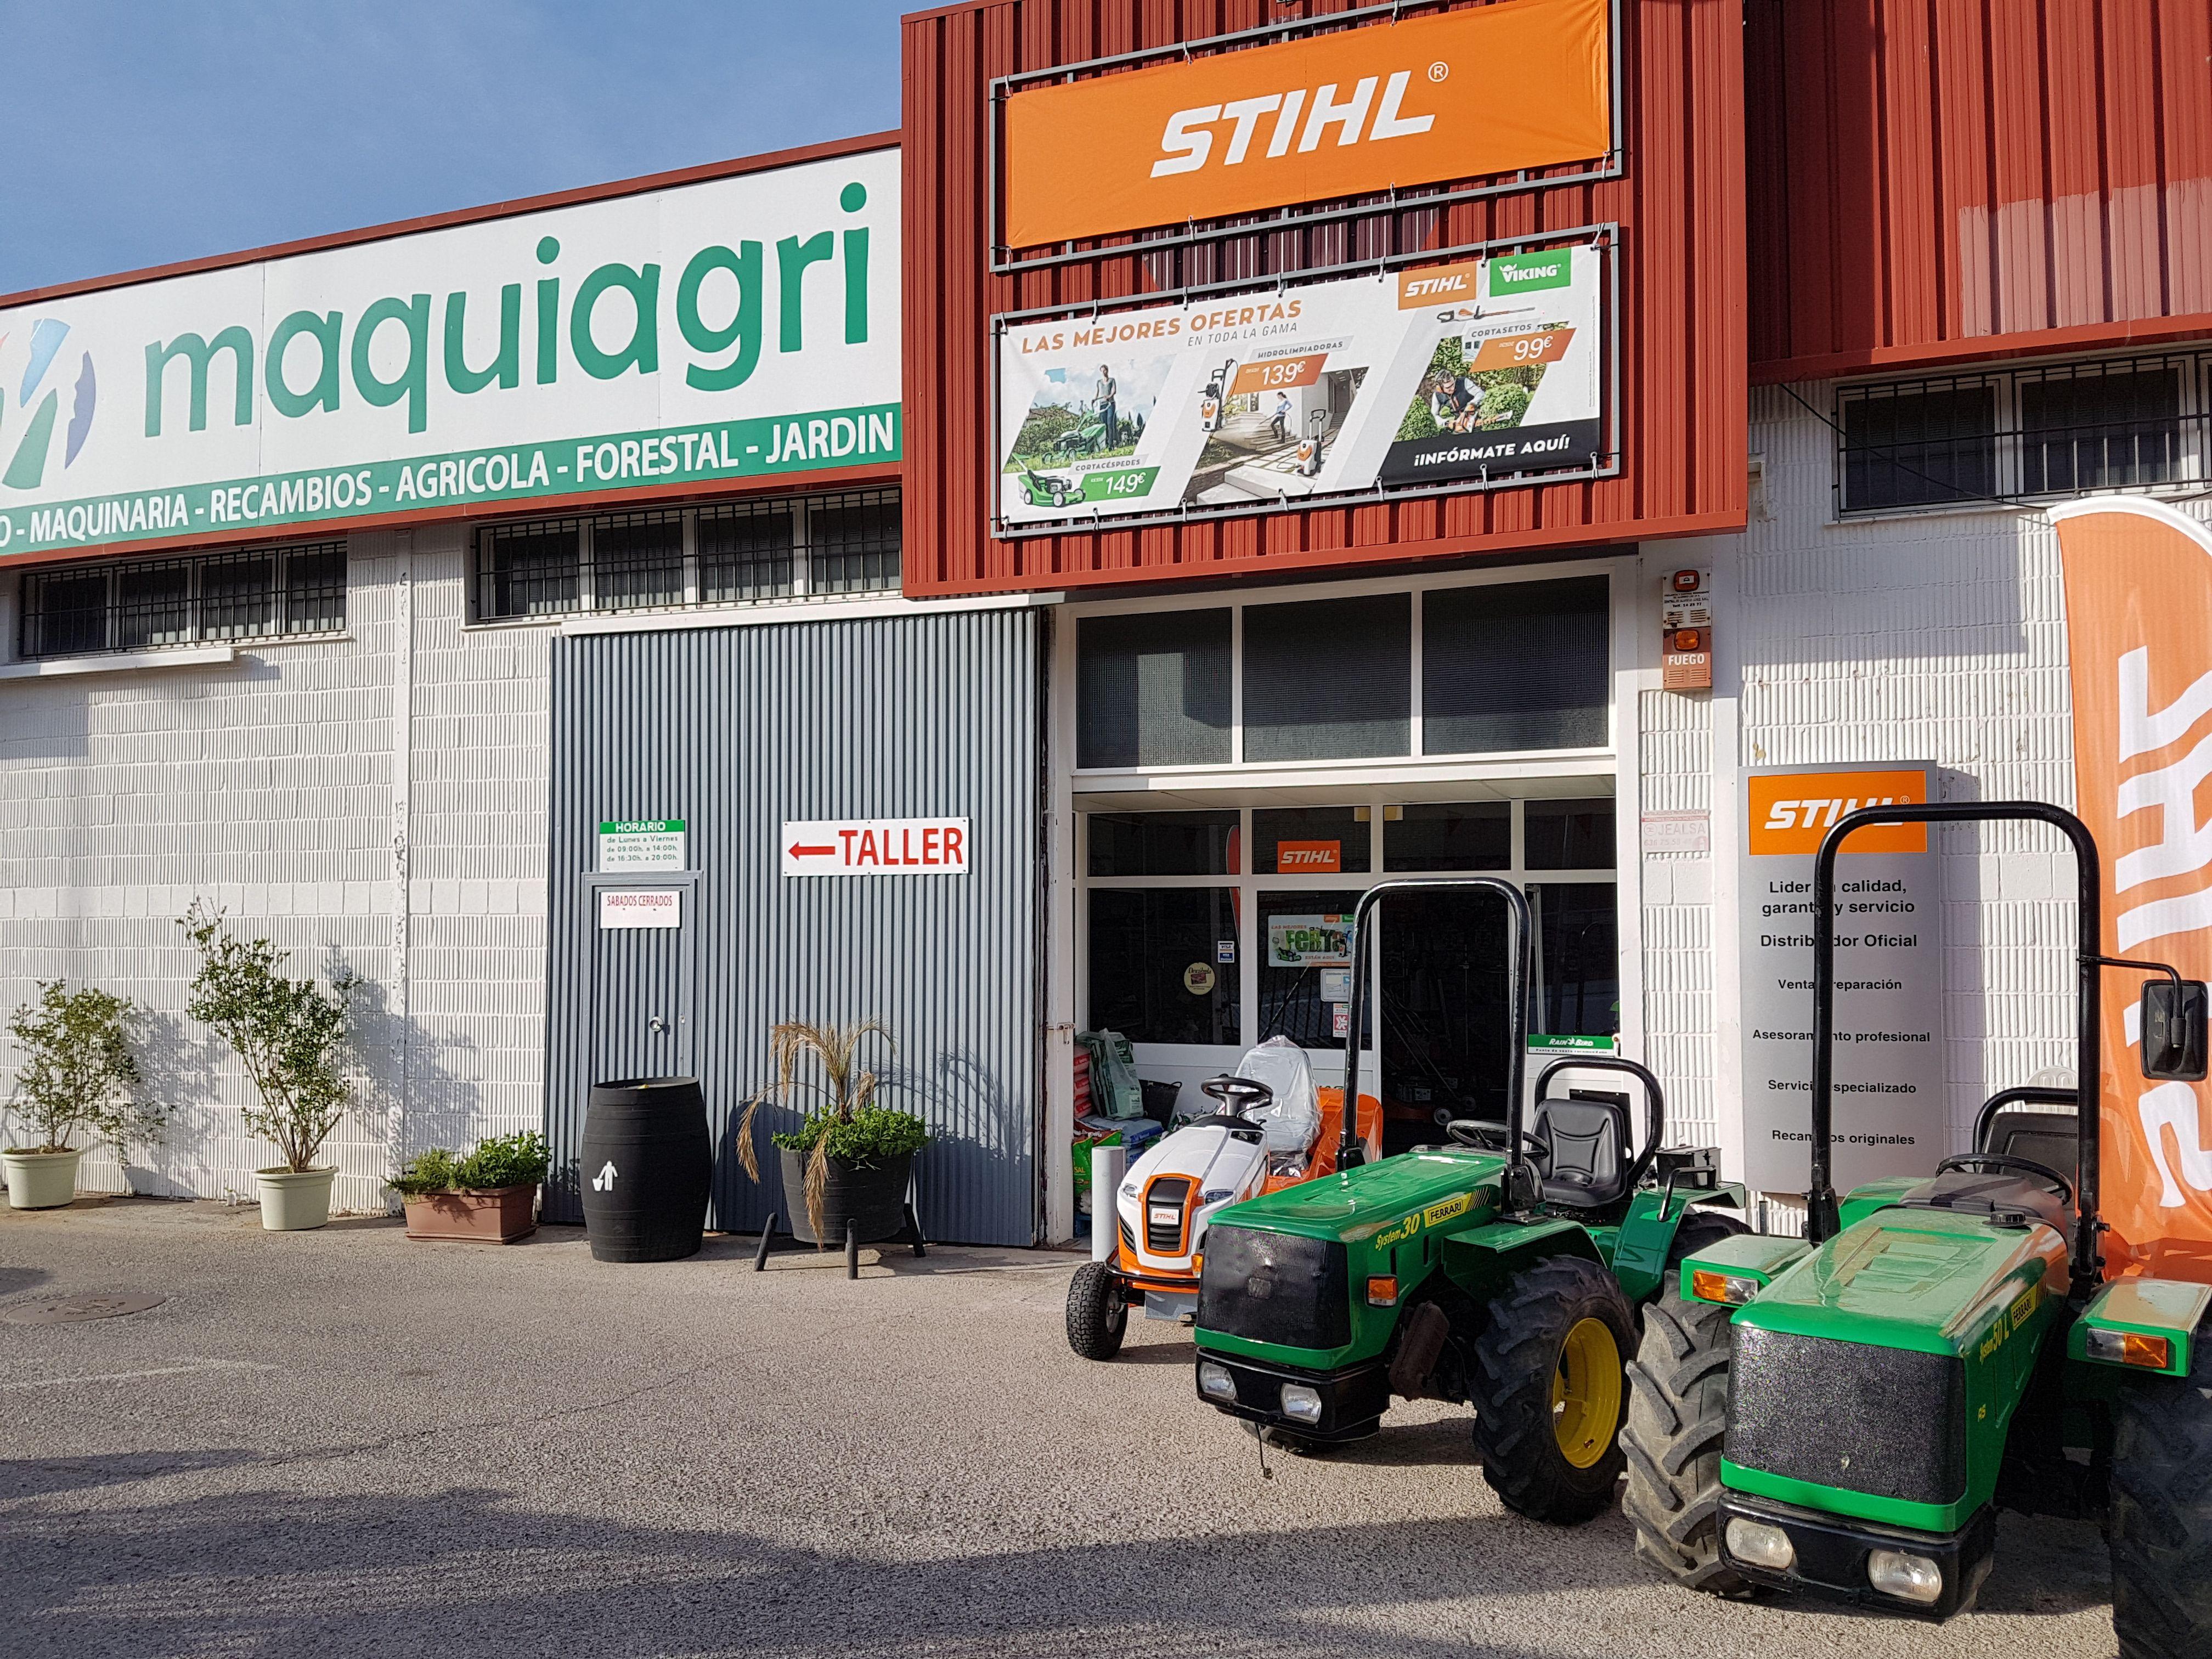 Foto 63 de Maquinaria agrícola en Jerez de la Frontera | Maquiagri